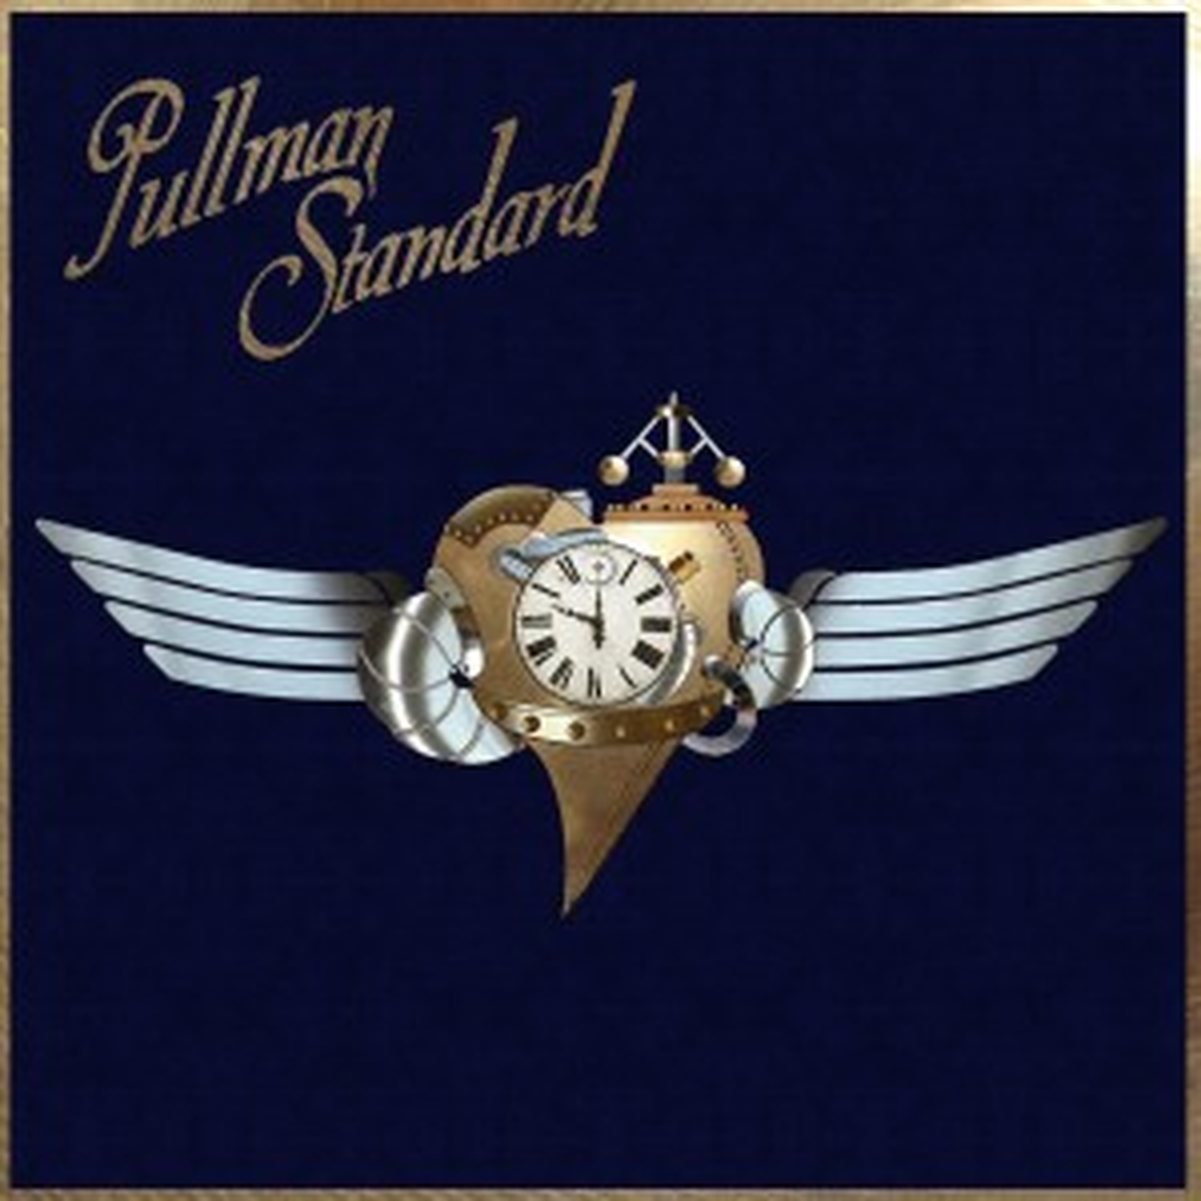 Pullman Standard wiki, Pullman Standard review, Pullman Standard history, Pullman Standard news